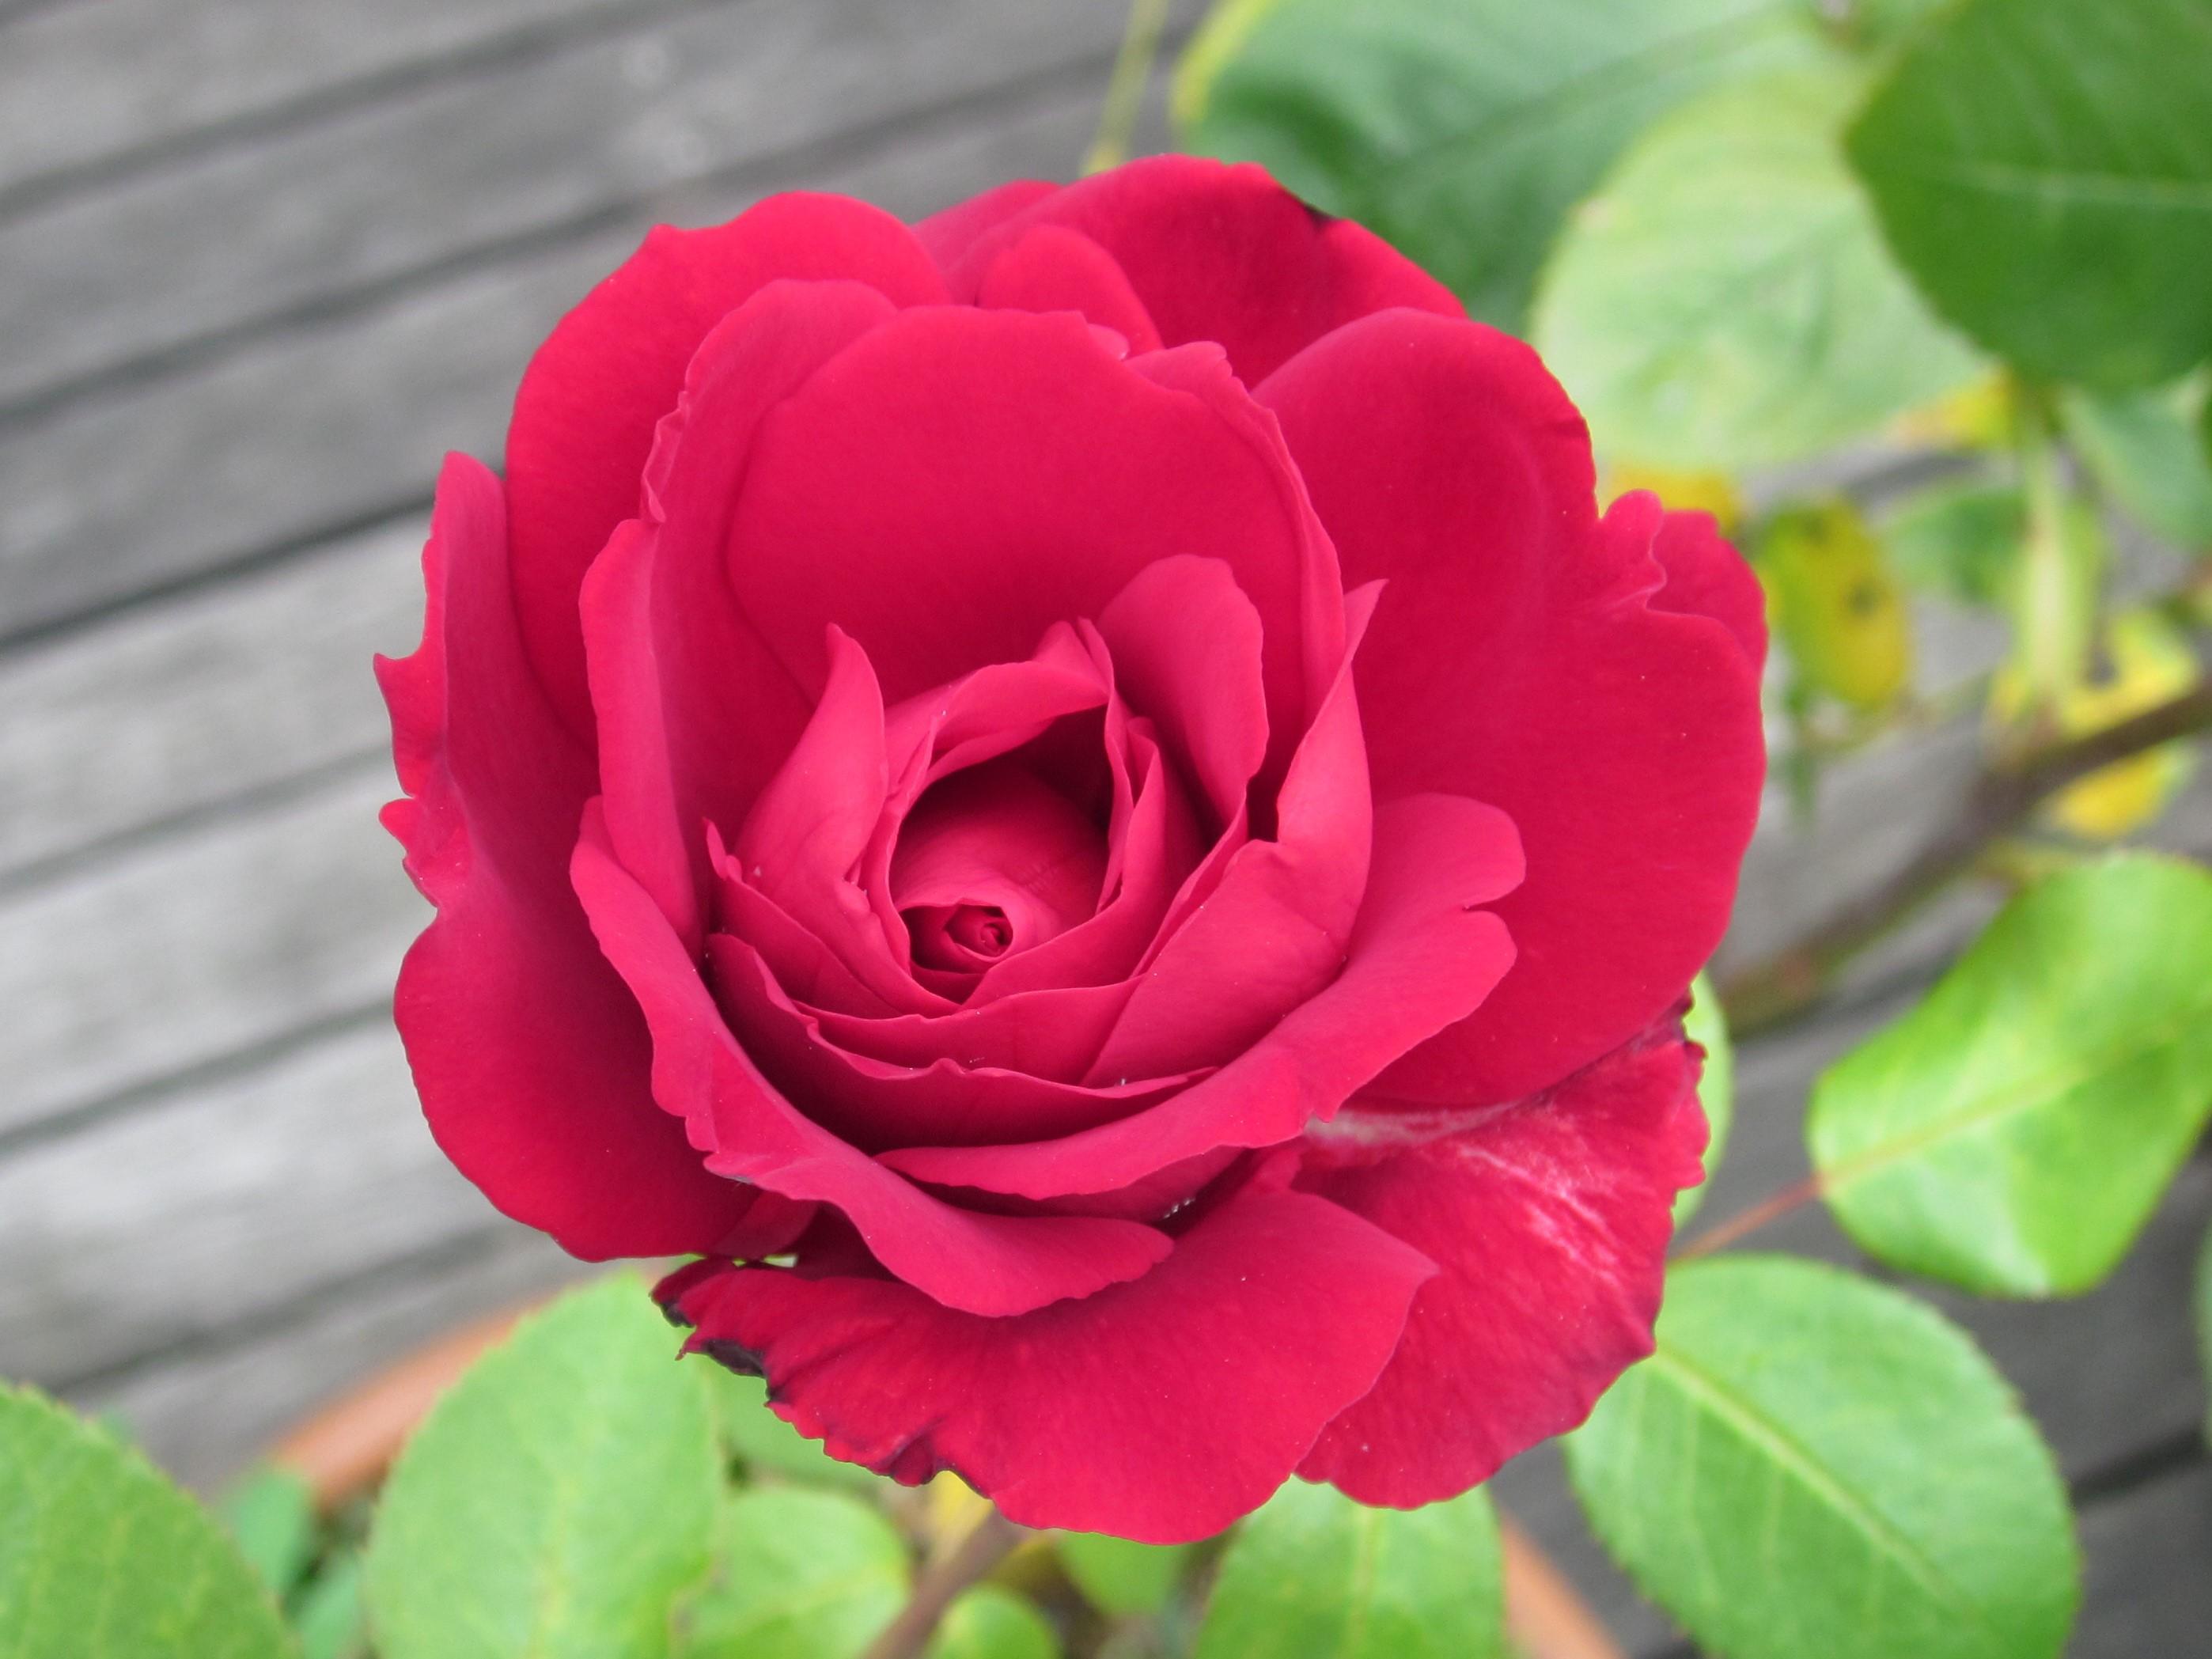 au coeur de la rose.JPG